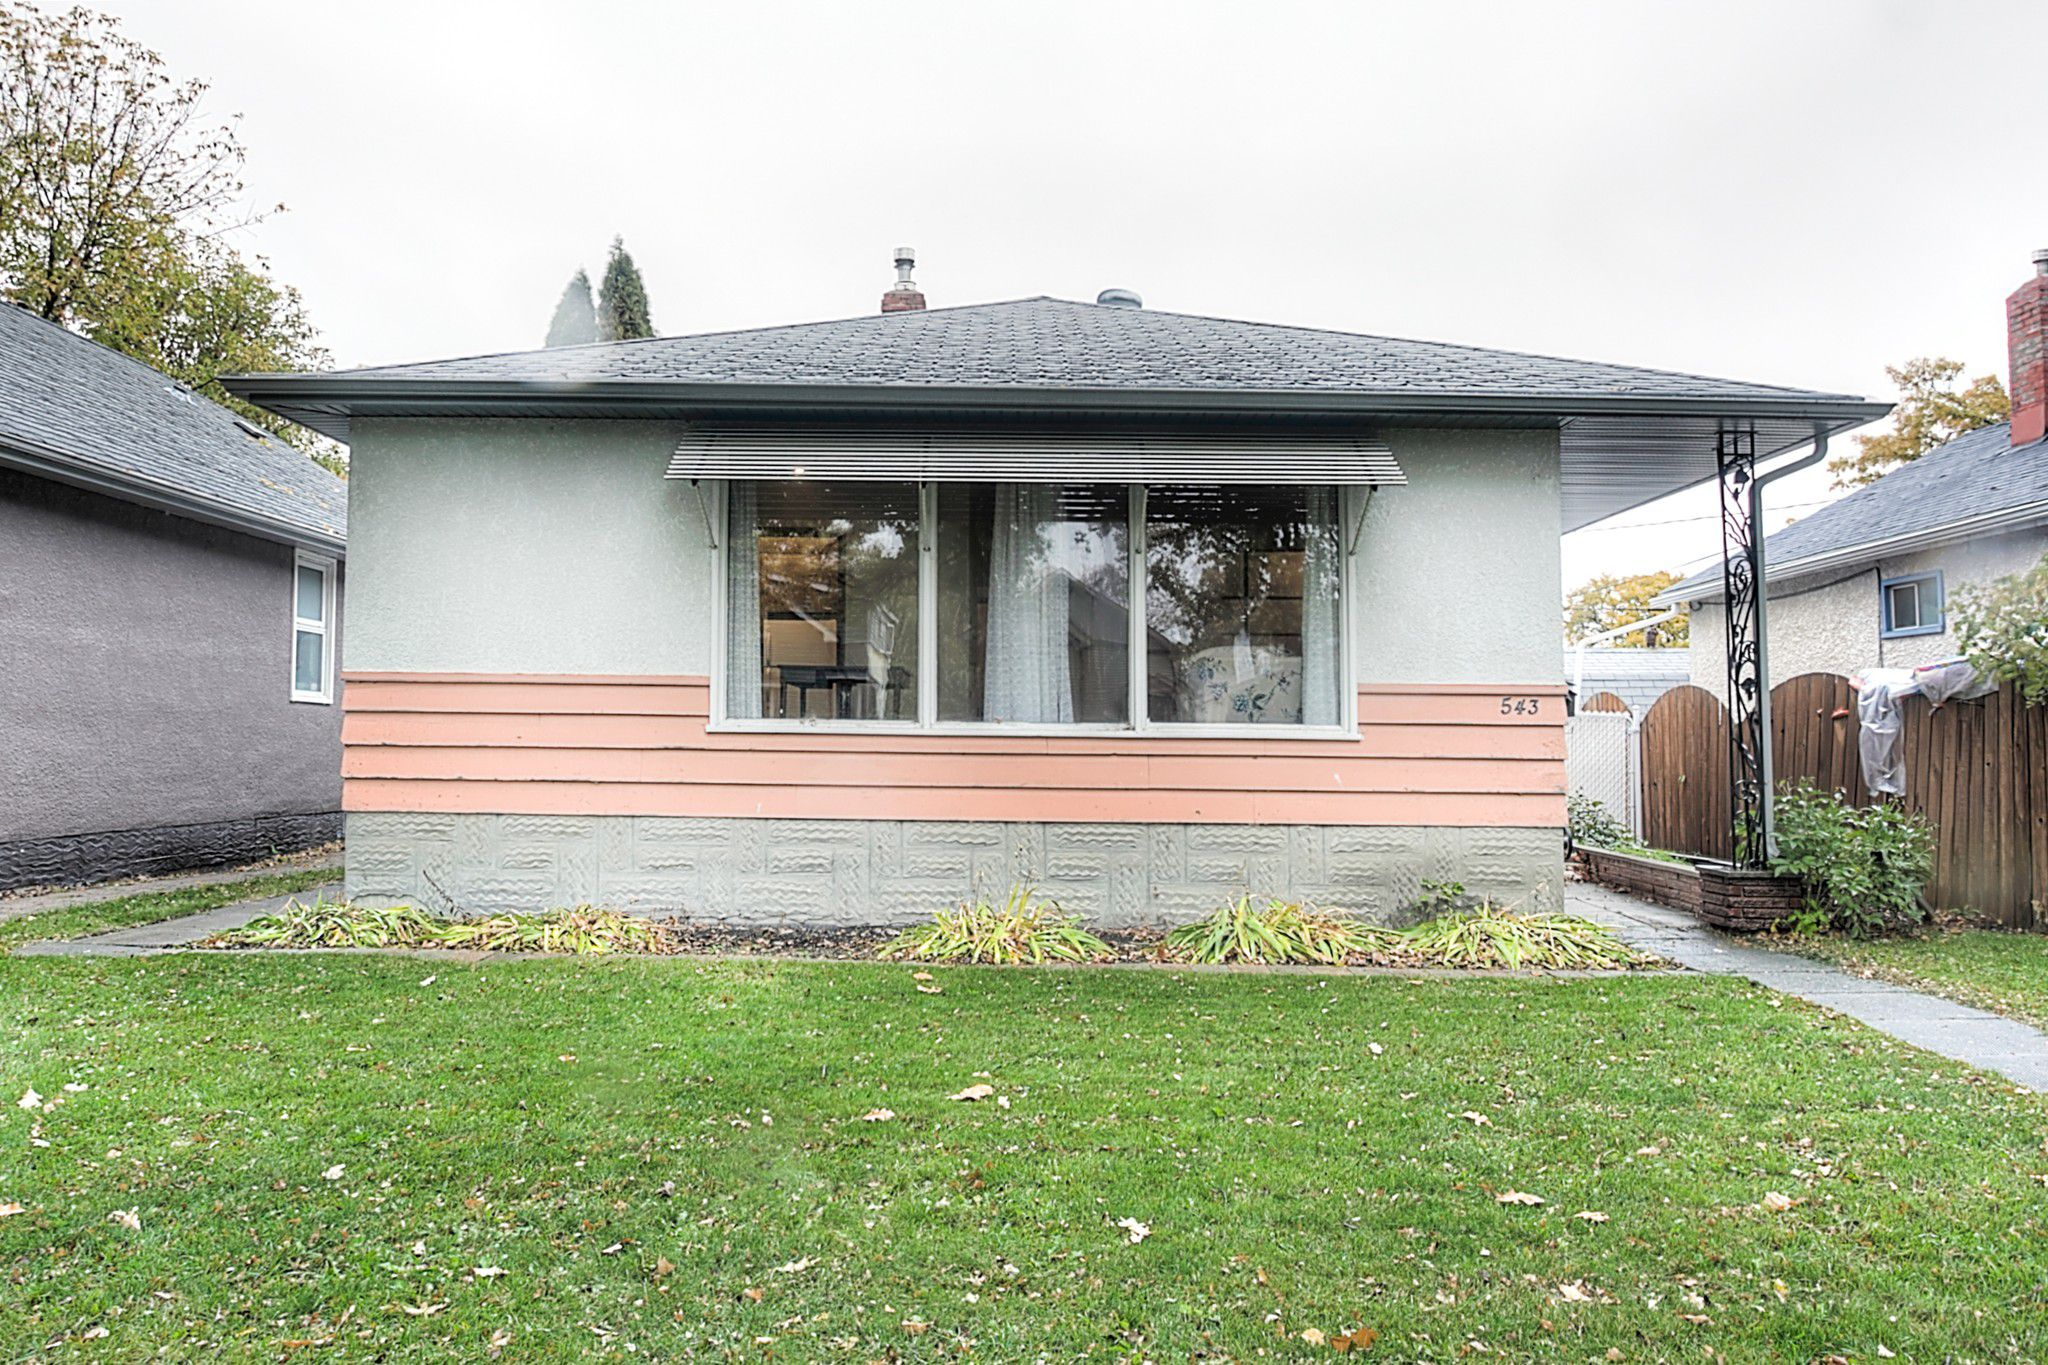 Main Photo: 543 Tremblay Street in Winnipeg: Single Family Detached for sale (1B)  : MLS®# 1827145